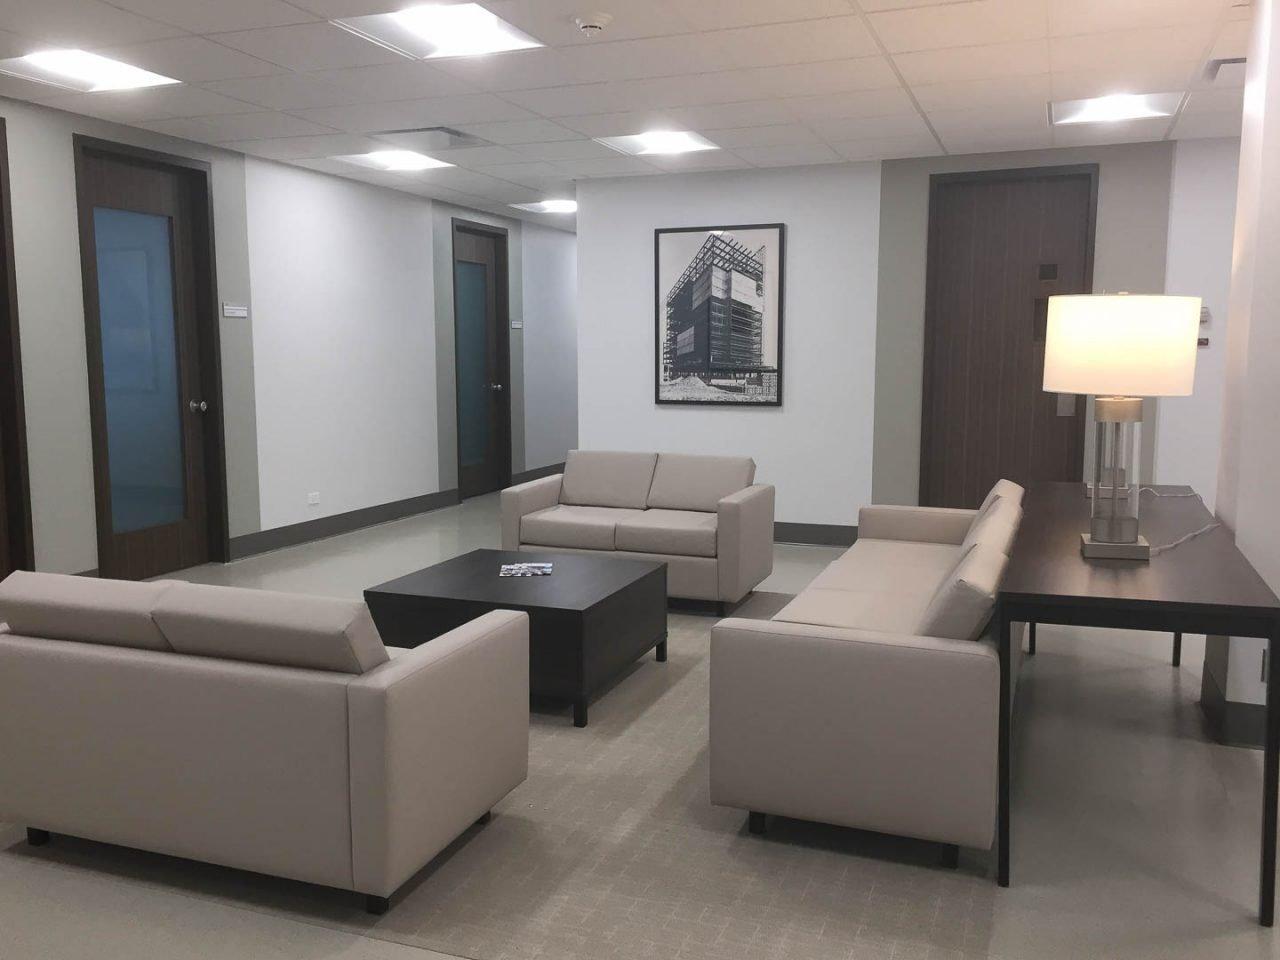 Lounge Chairs and Sofa